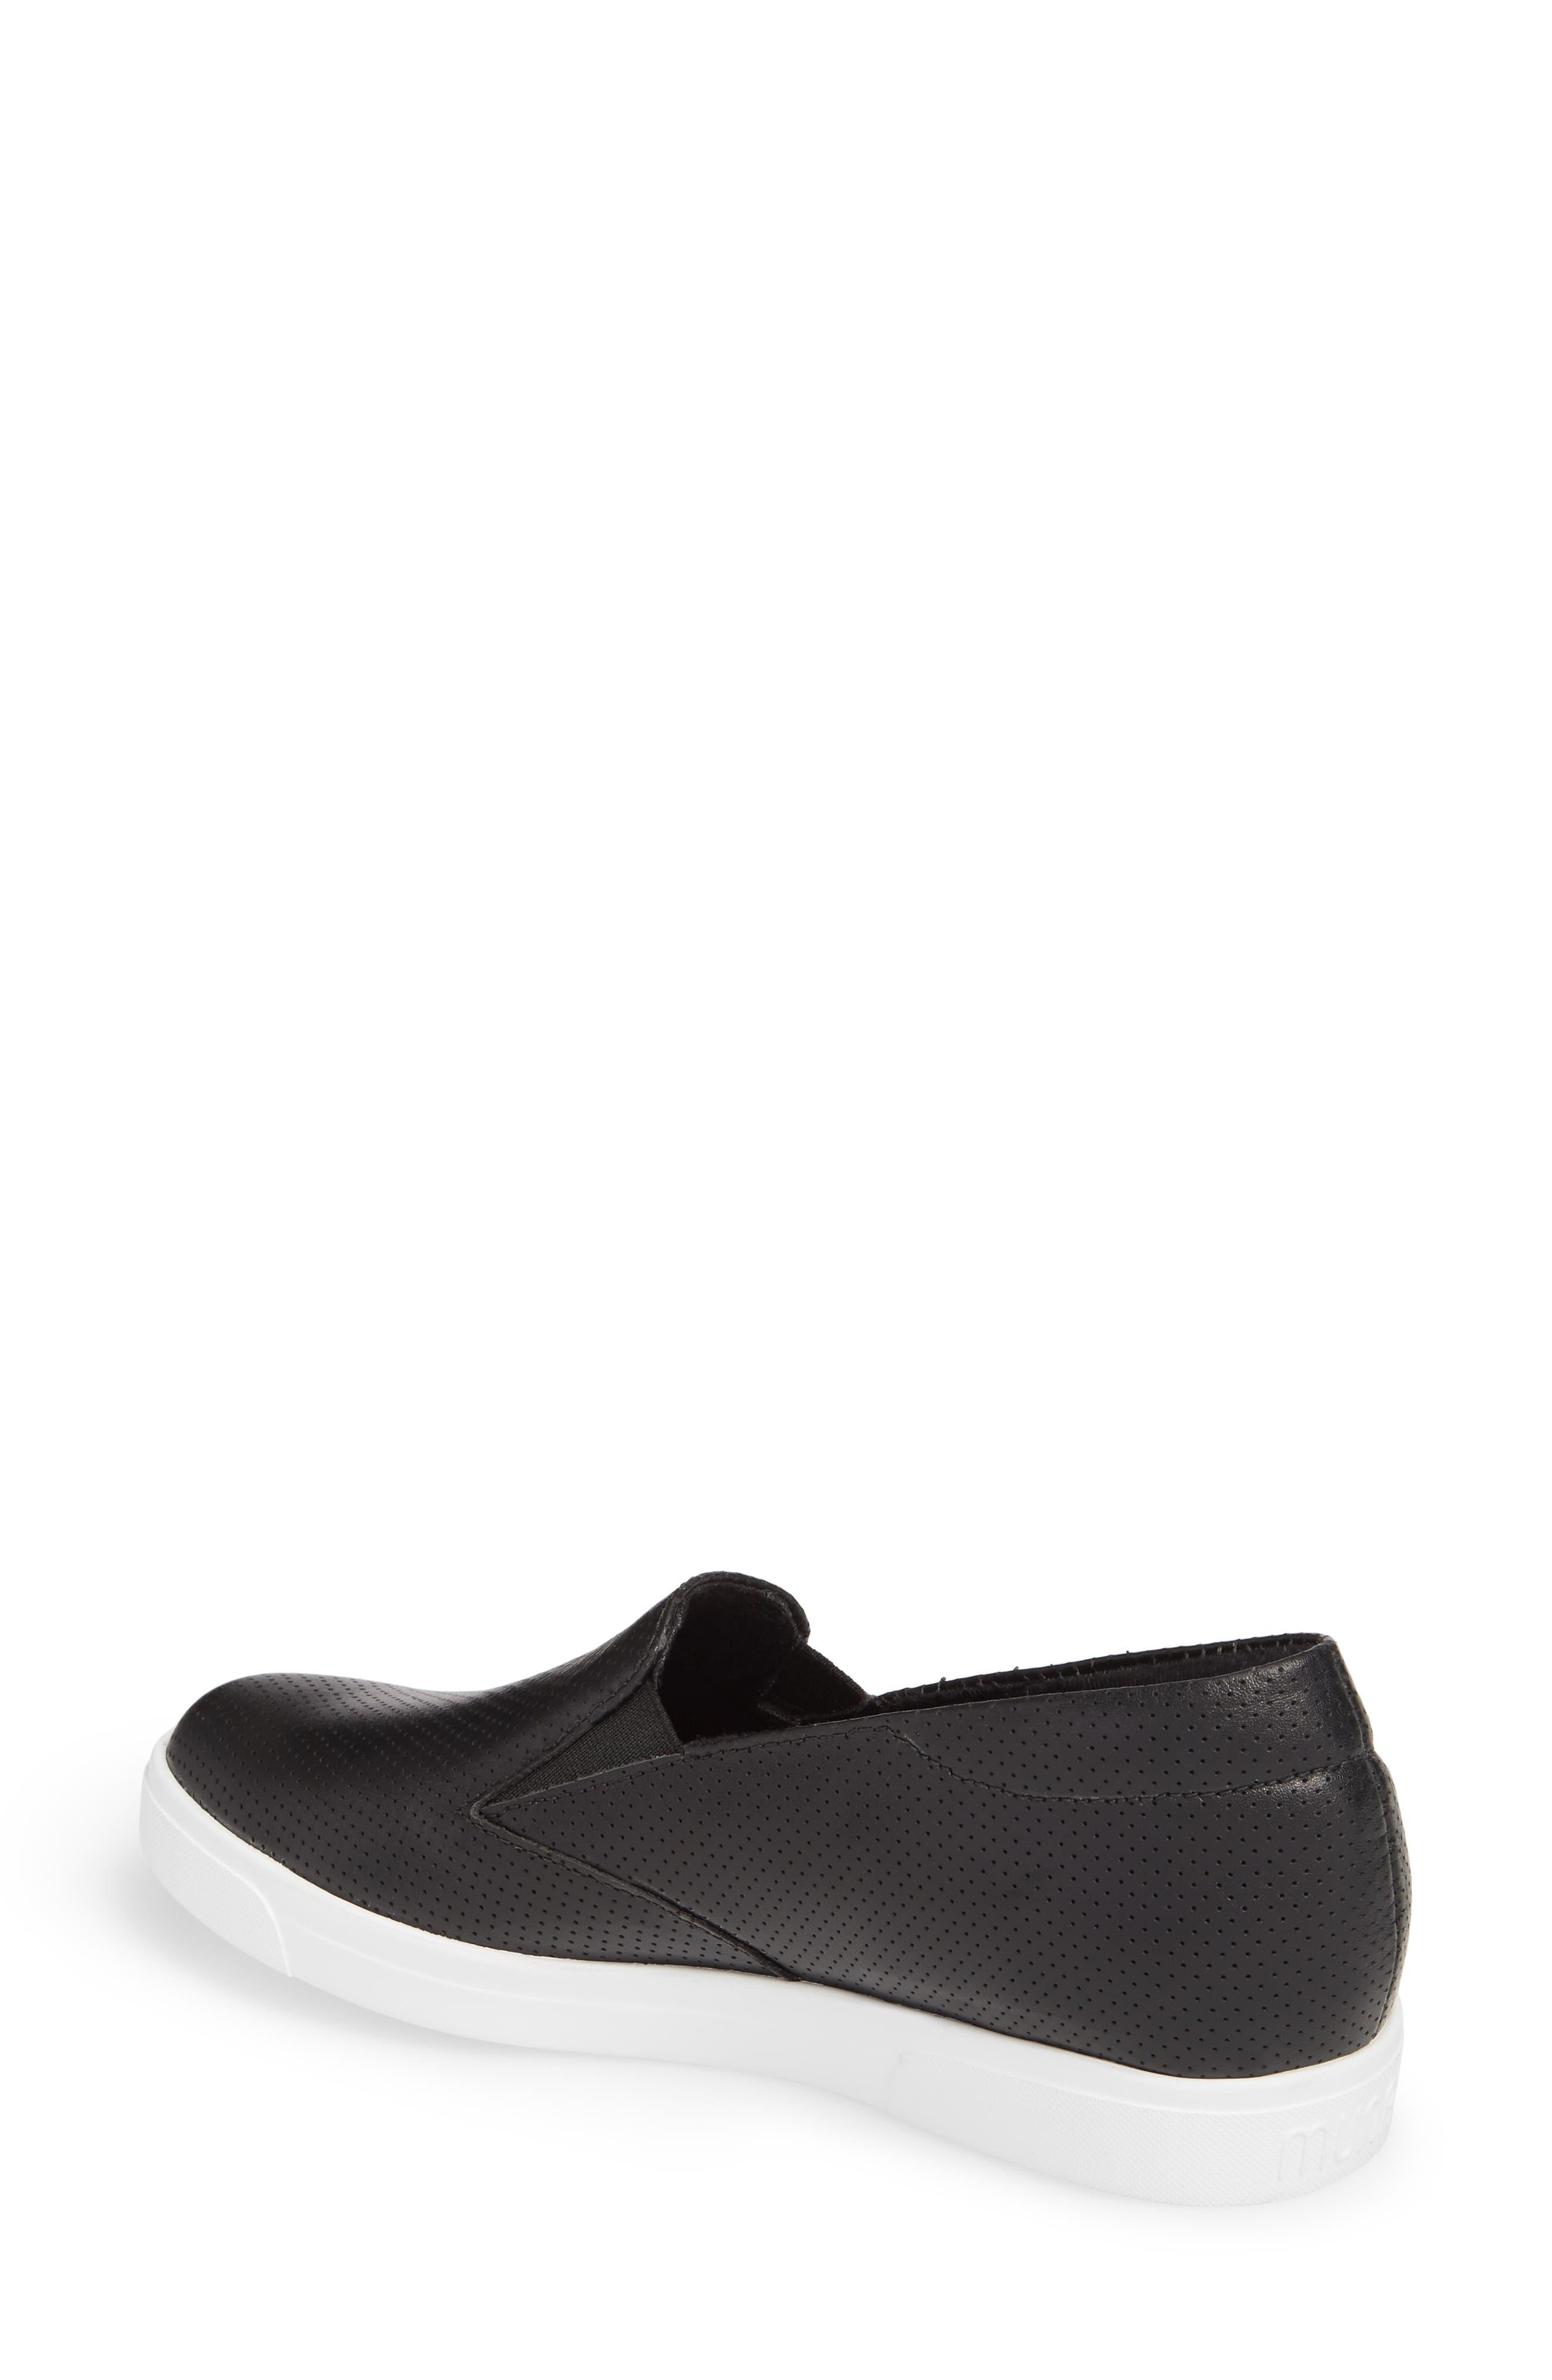 Alternate Image 2  - Munro Lulu Slip-On Sneaker (Women)